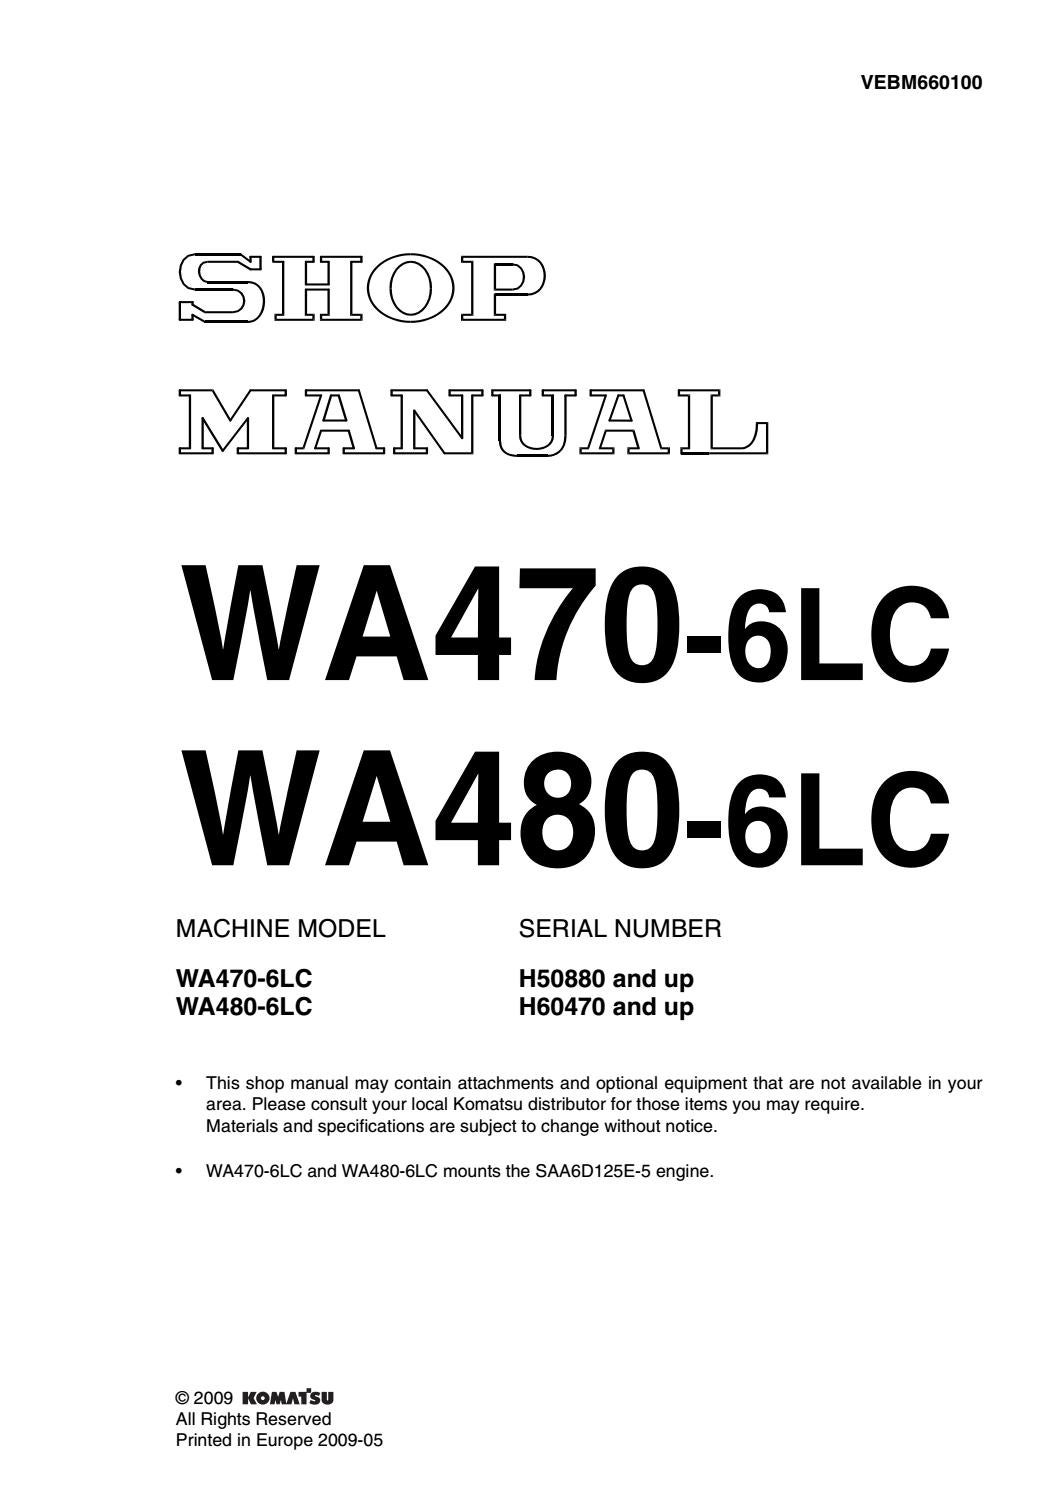 Komatsu WA470-6LC Wheel Loader Service Repair Manual SNH50880 and up by  16326108 - issuu